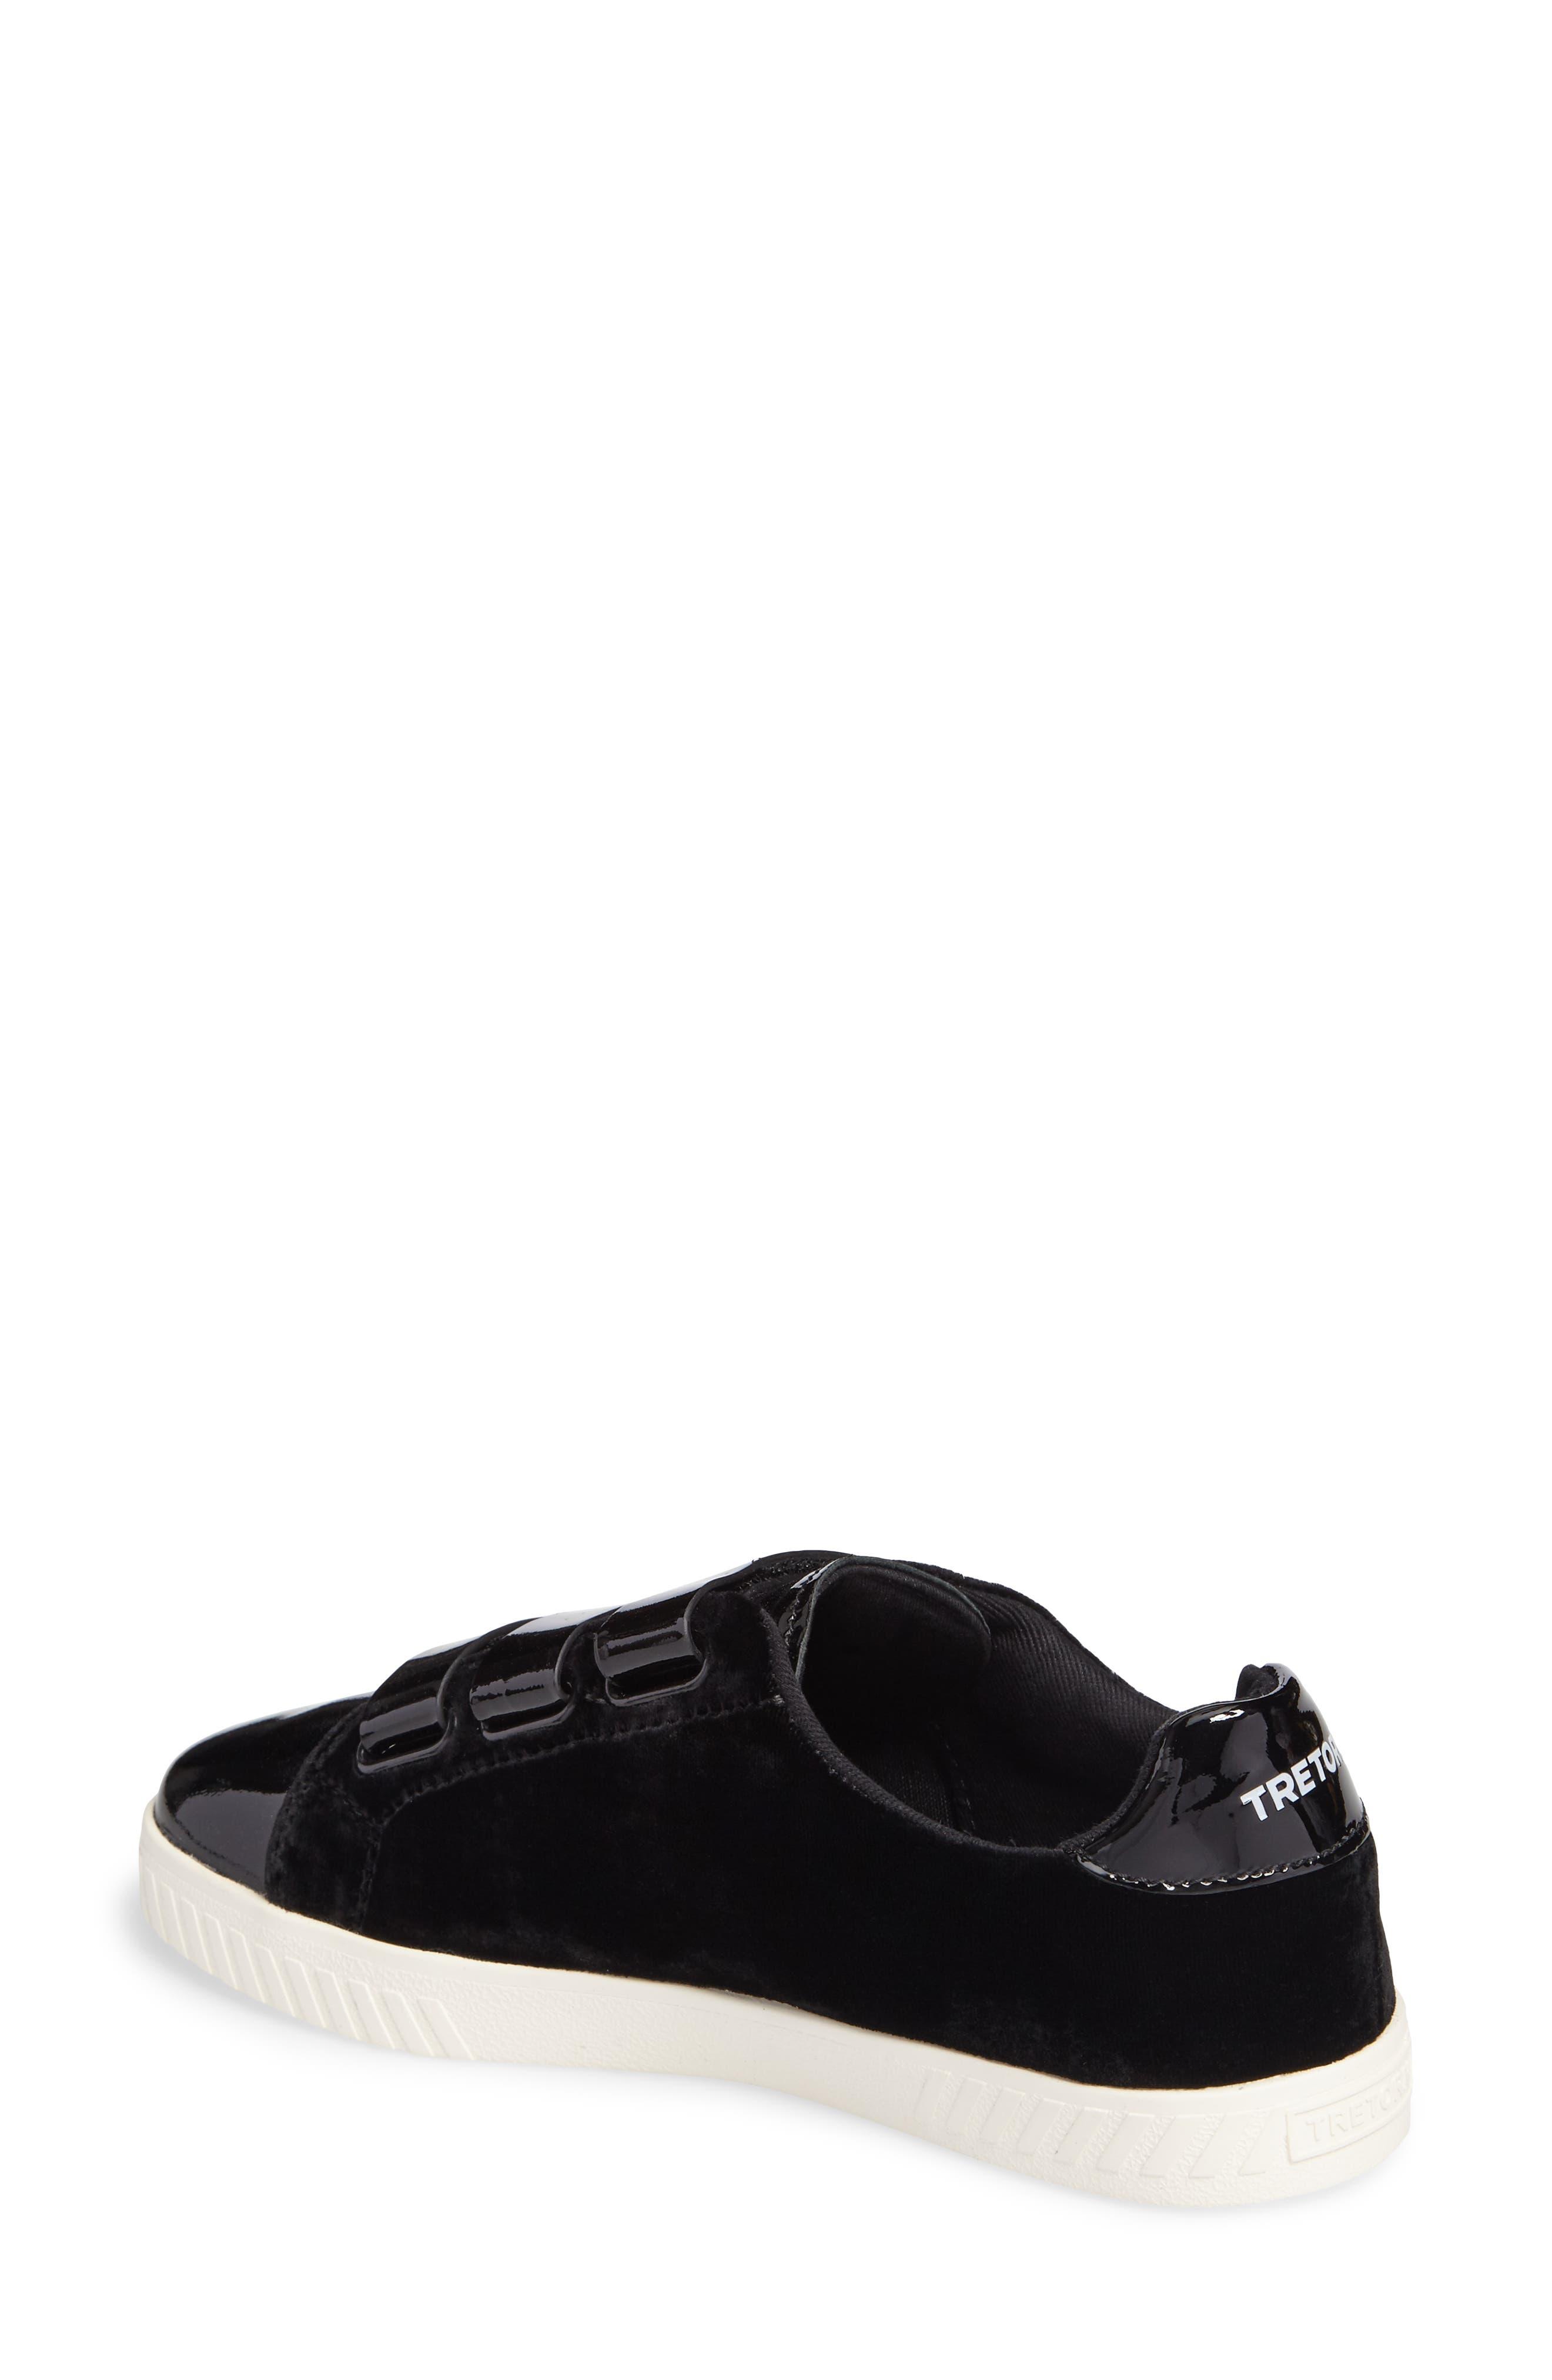 Carry Sneaker,                             Alternate thumbnail 2, color,                             001